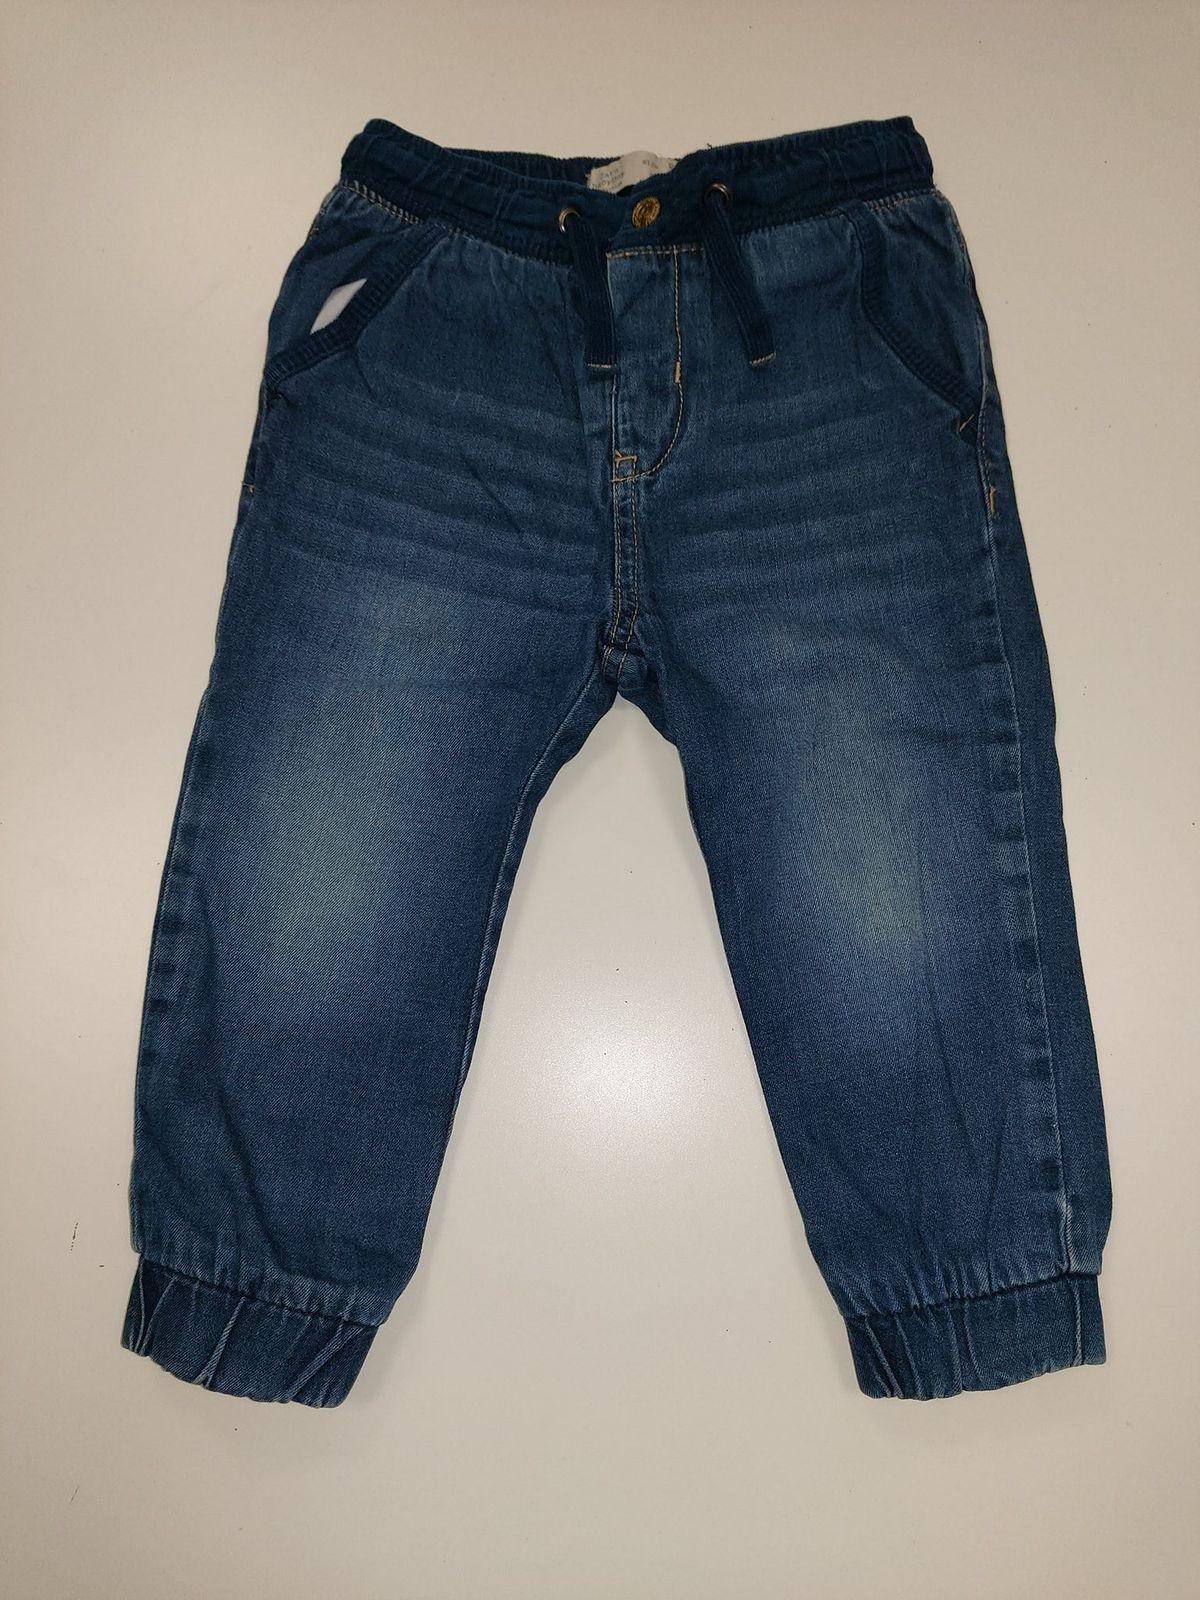 Zara BabyBoy jeans morbido 18/24mesi € 9,90 13965